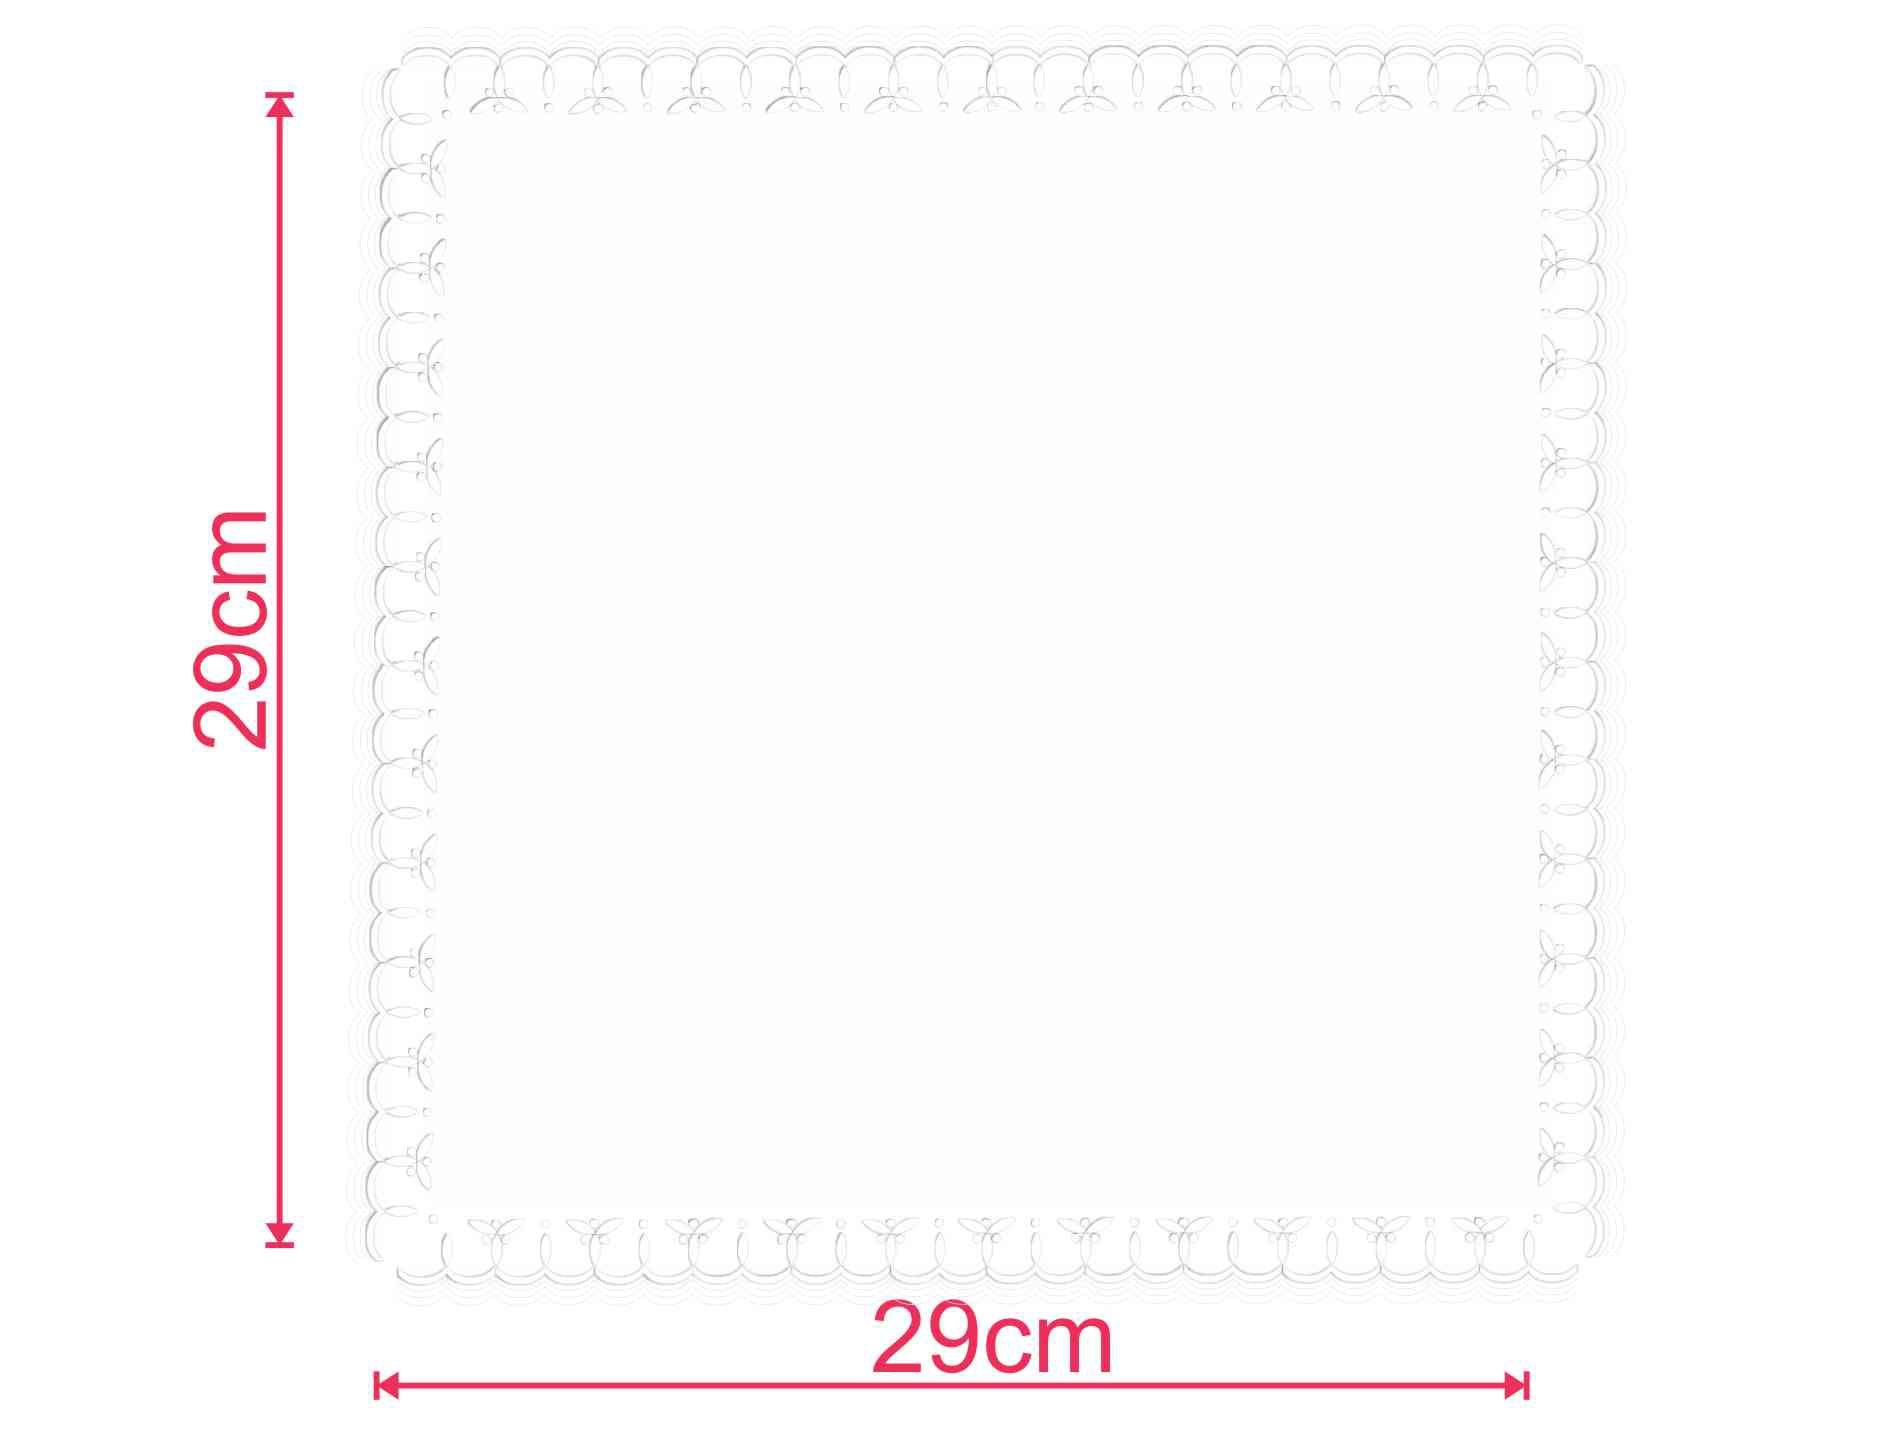 Guardanapo de papel mod. Trevo 29x29 cm - Personalizado - 100 unidades  - Persona Guardanapos & Cia